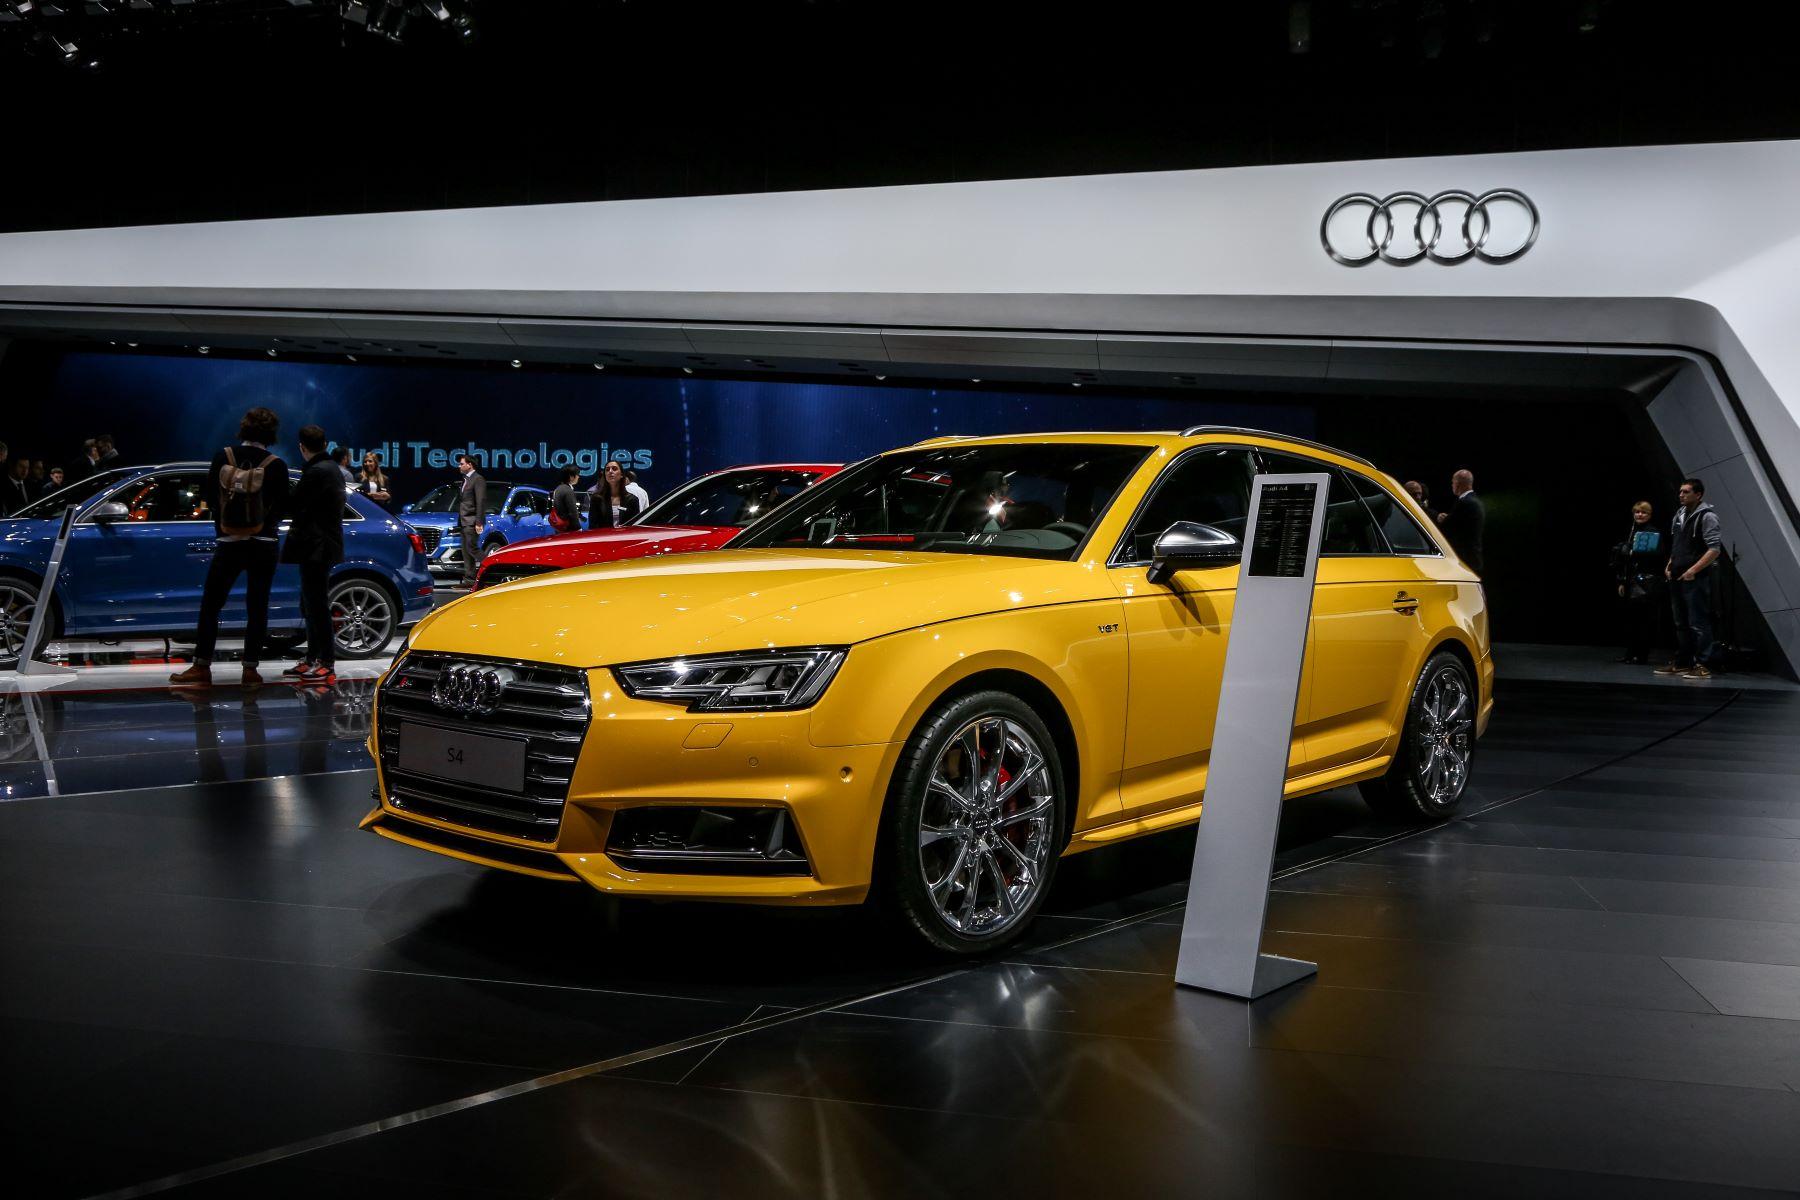 An Audi S4 model in yellow gold at the 86th Geneva International Motorshow